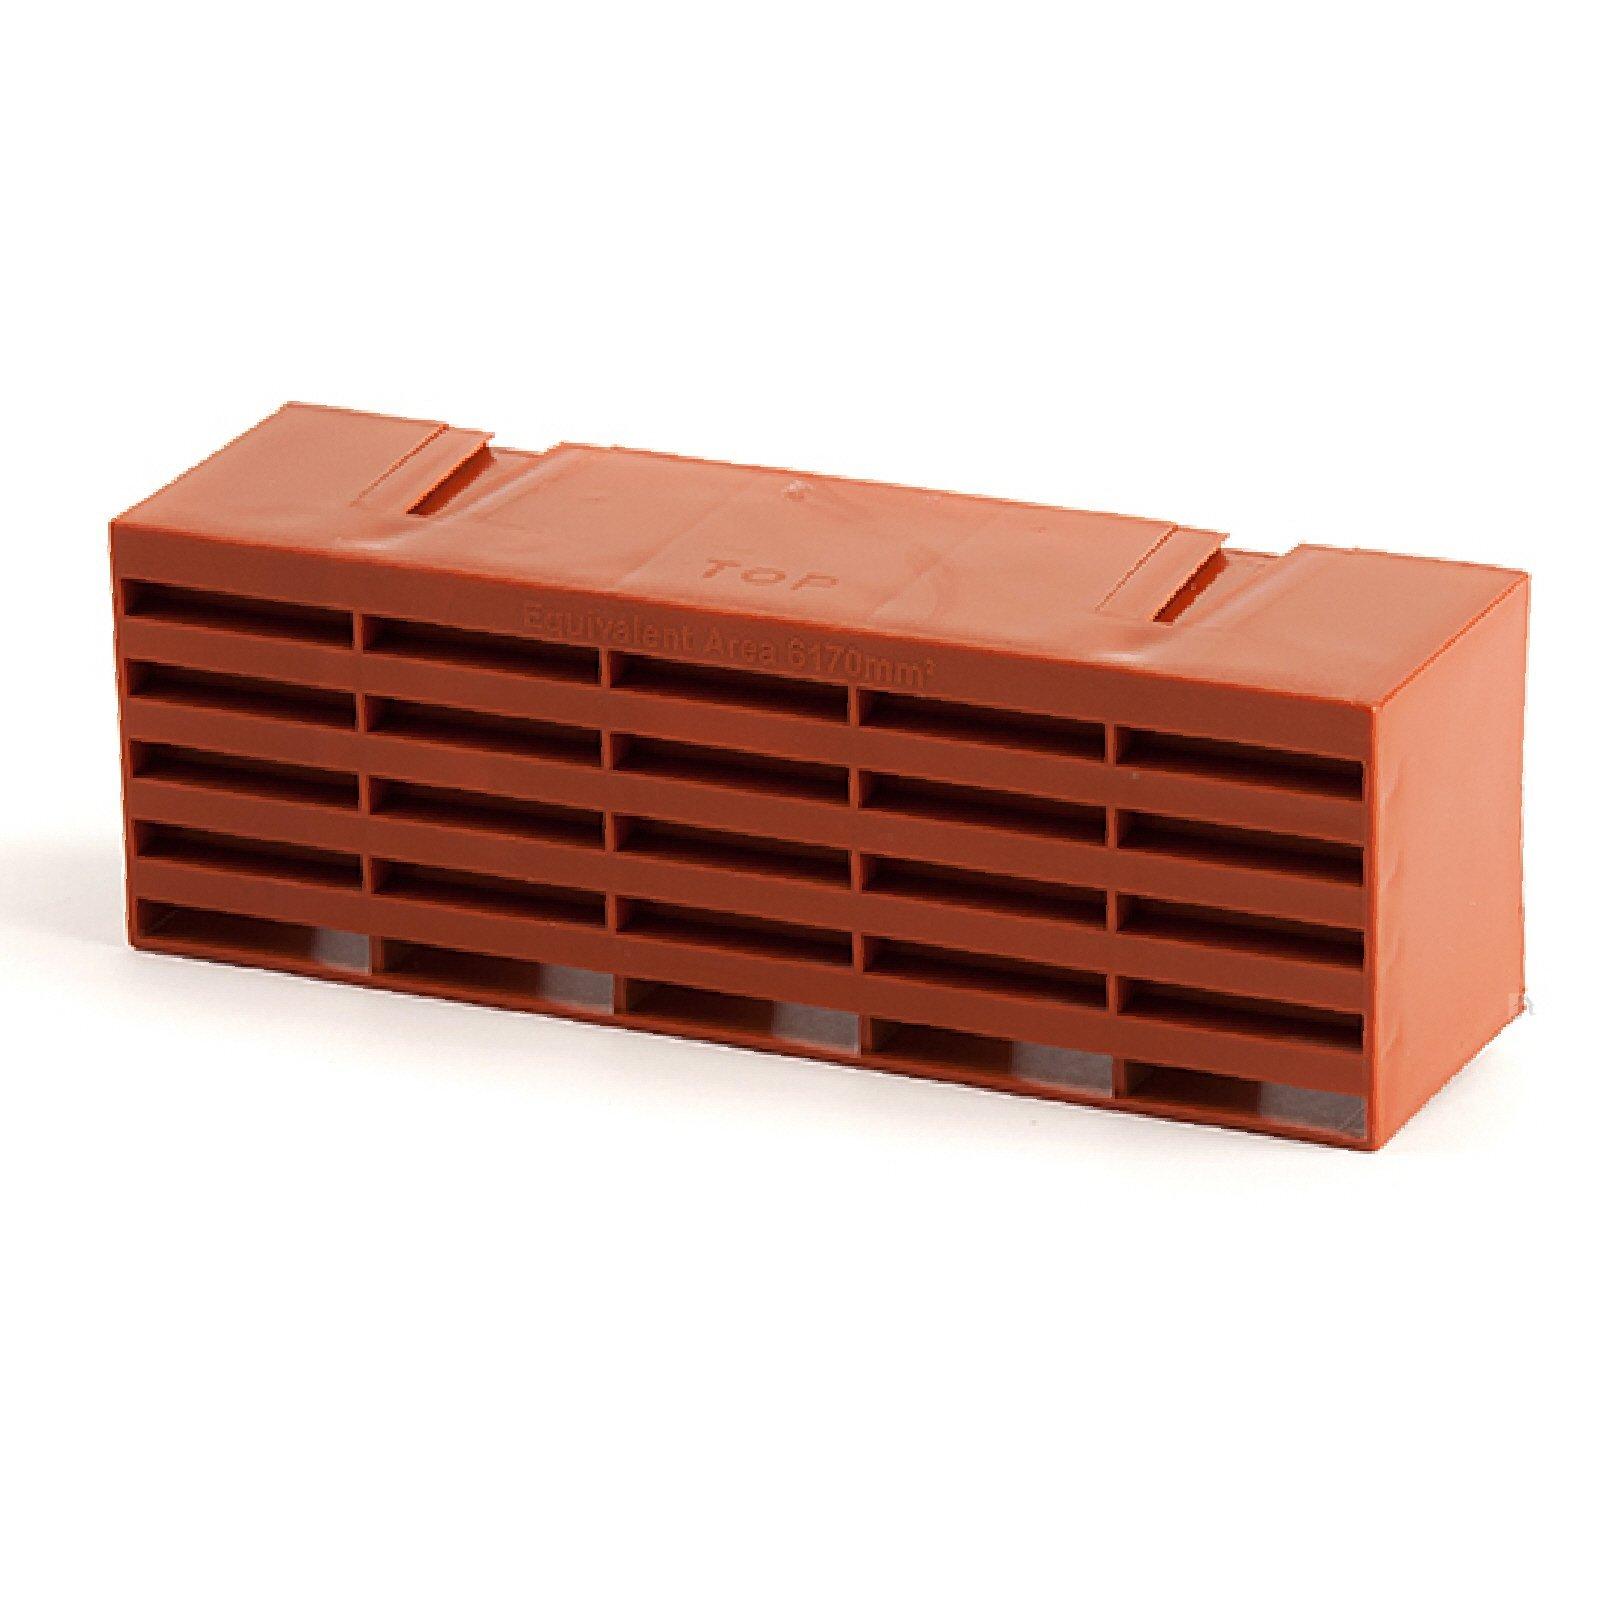 5 x Terracotta Air Bricks Vent 9'' x 3'' Airbrick Grille Air Flow Brick Vents Ventilation